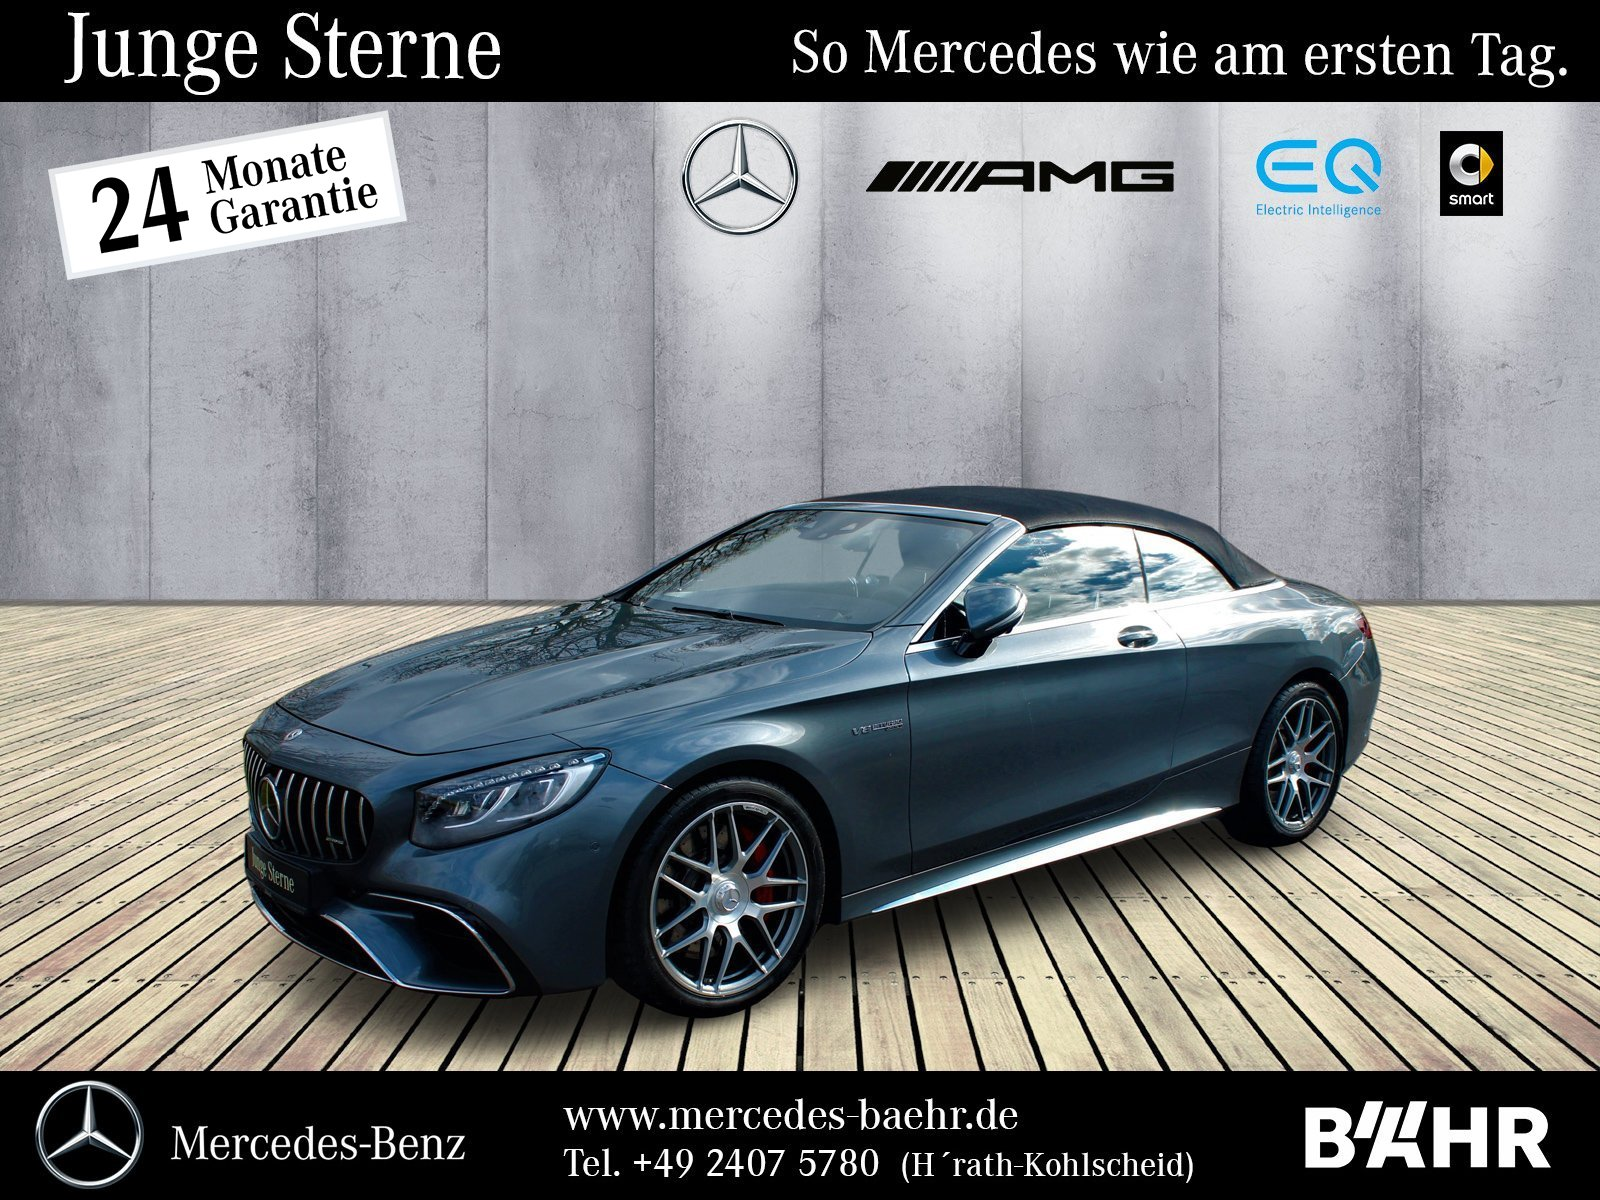 Mercedes-Benz S 63 AMG 4M+ Cabrio Comand/ILS/Burmester/Head-Up, Jahr 2018, Benzin